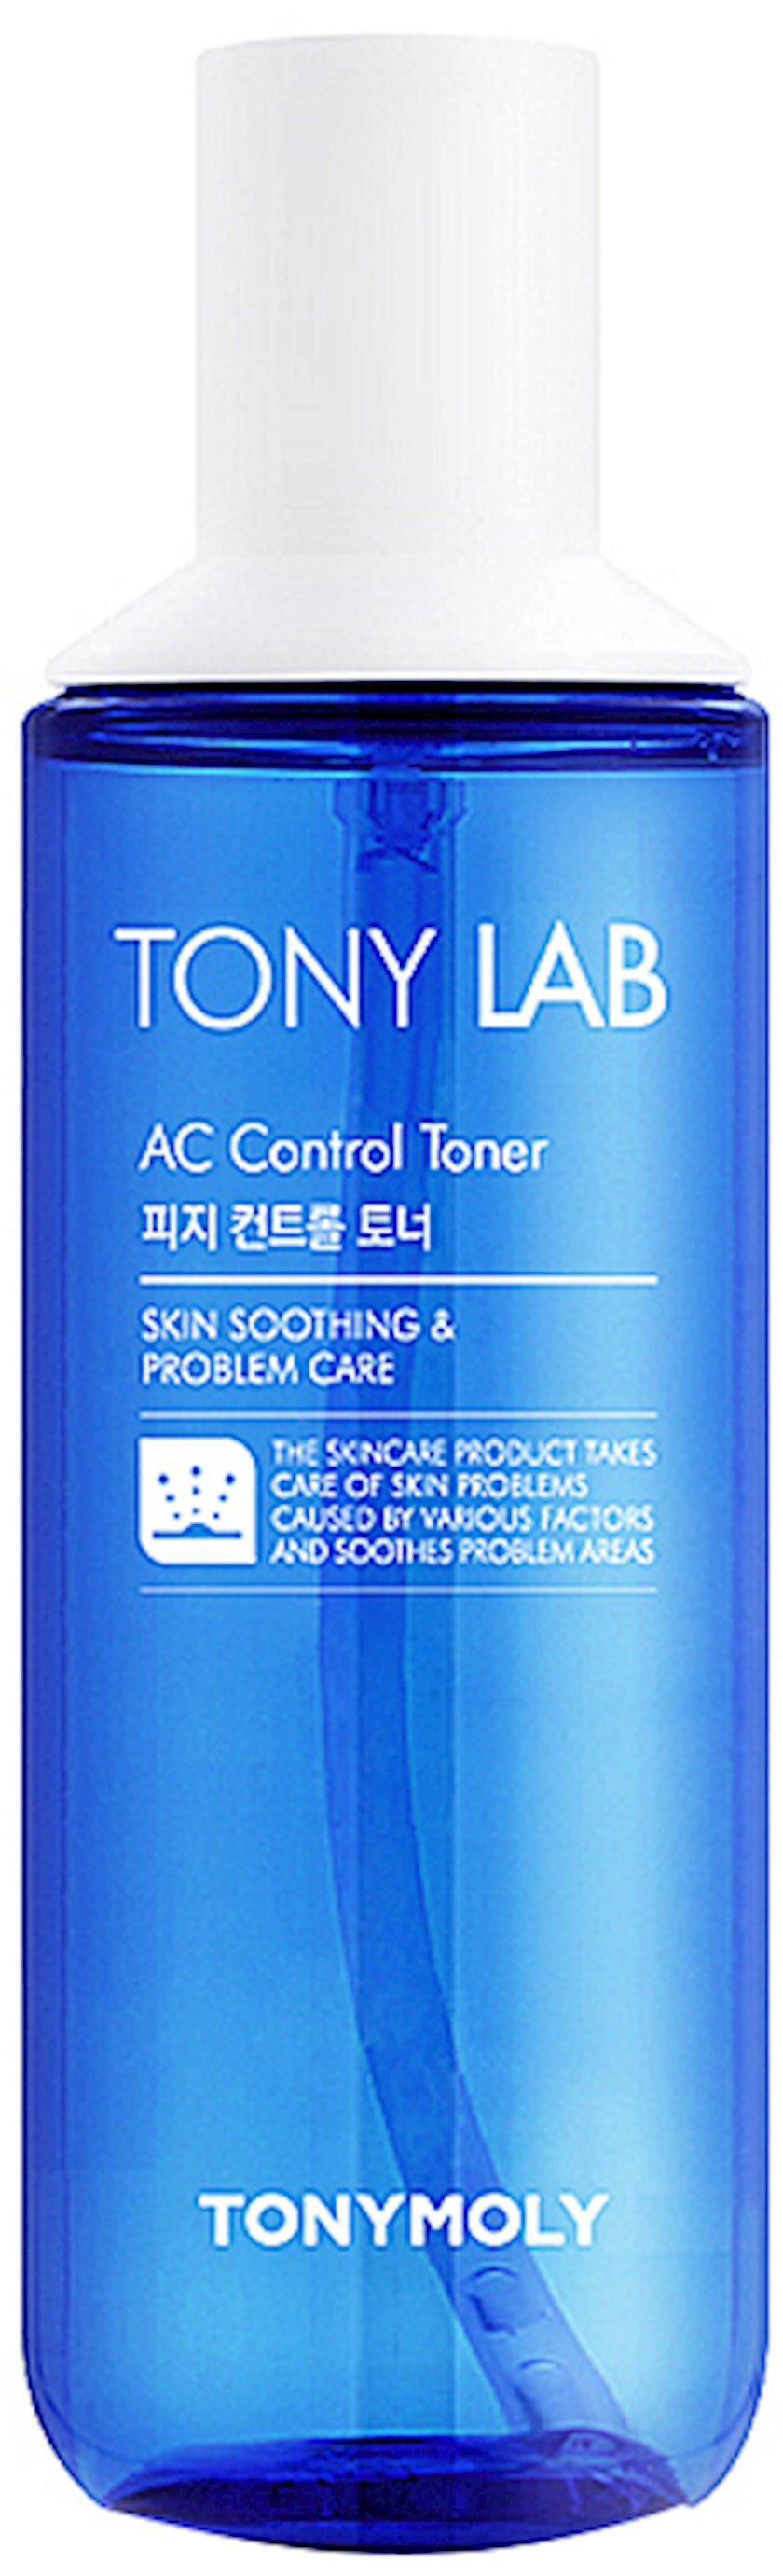 Üz üçün tonik Tony Moly Lab AC Control Toner 180 ml